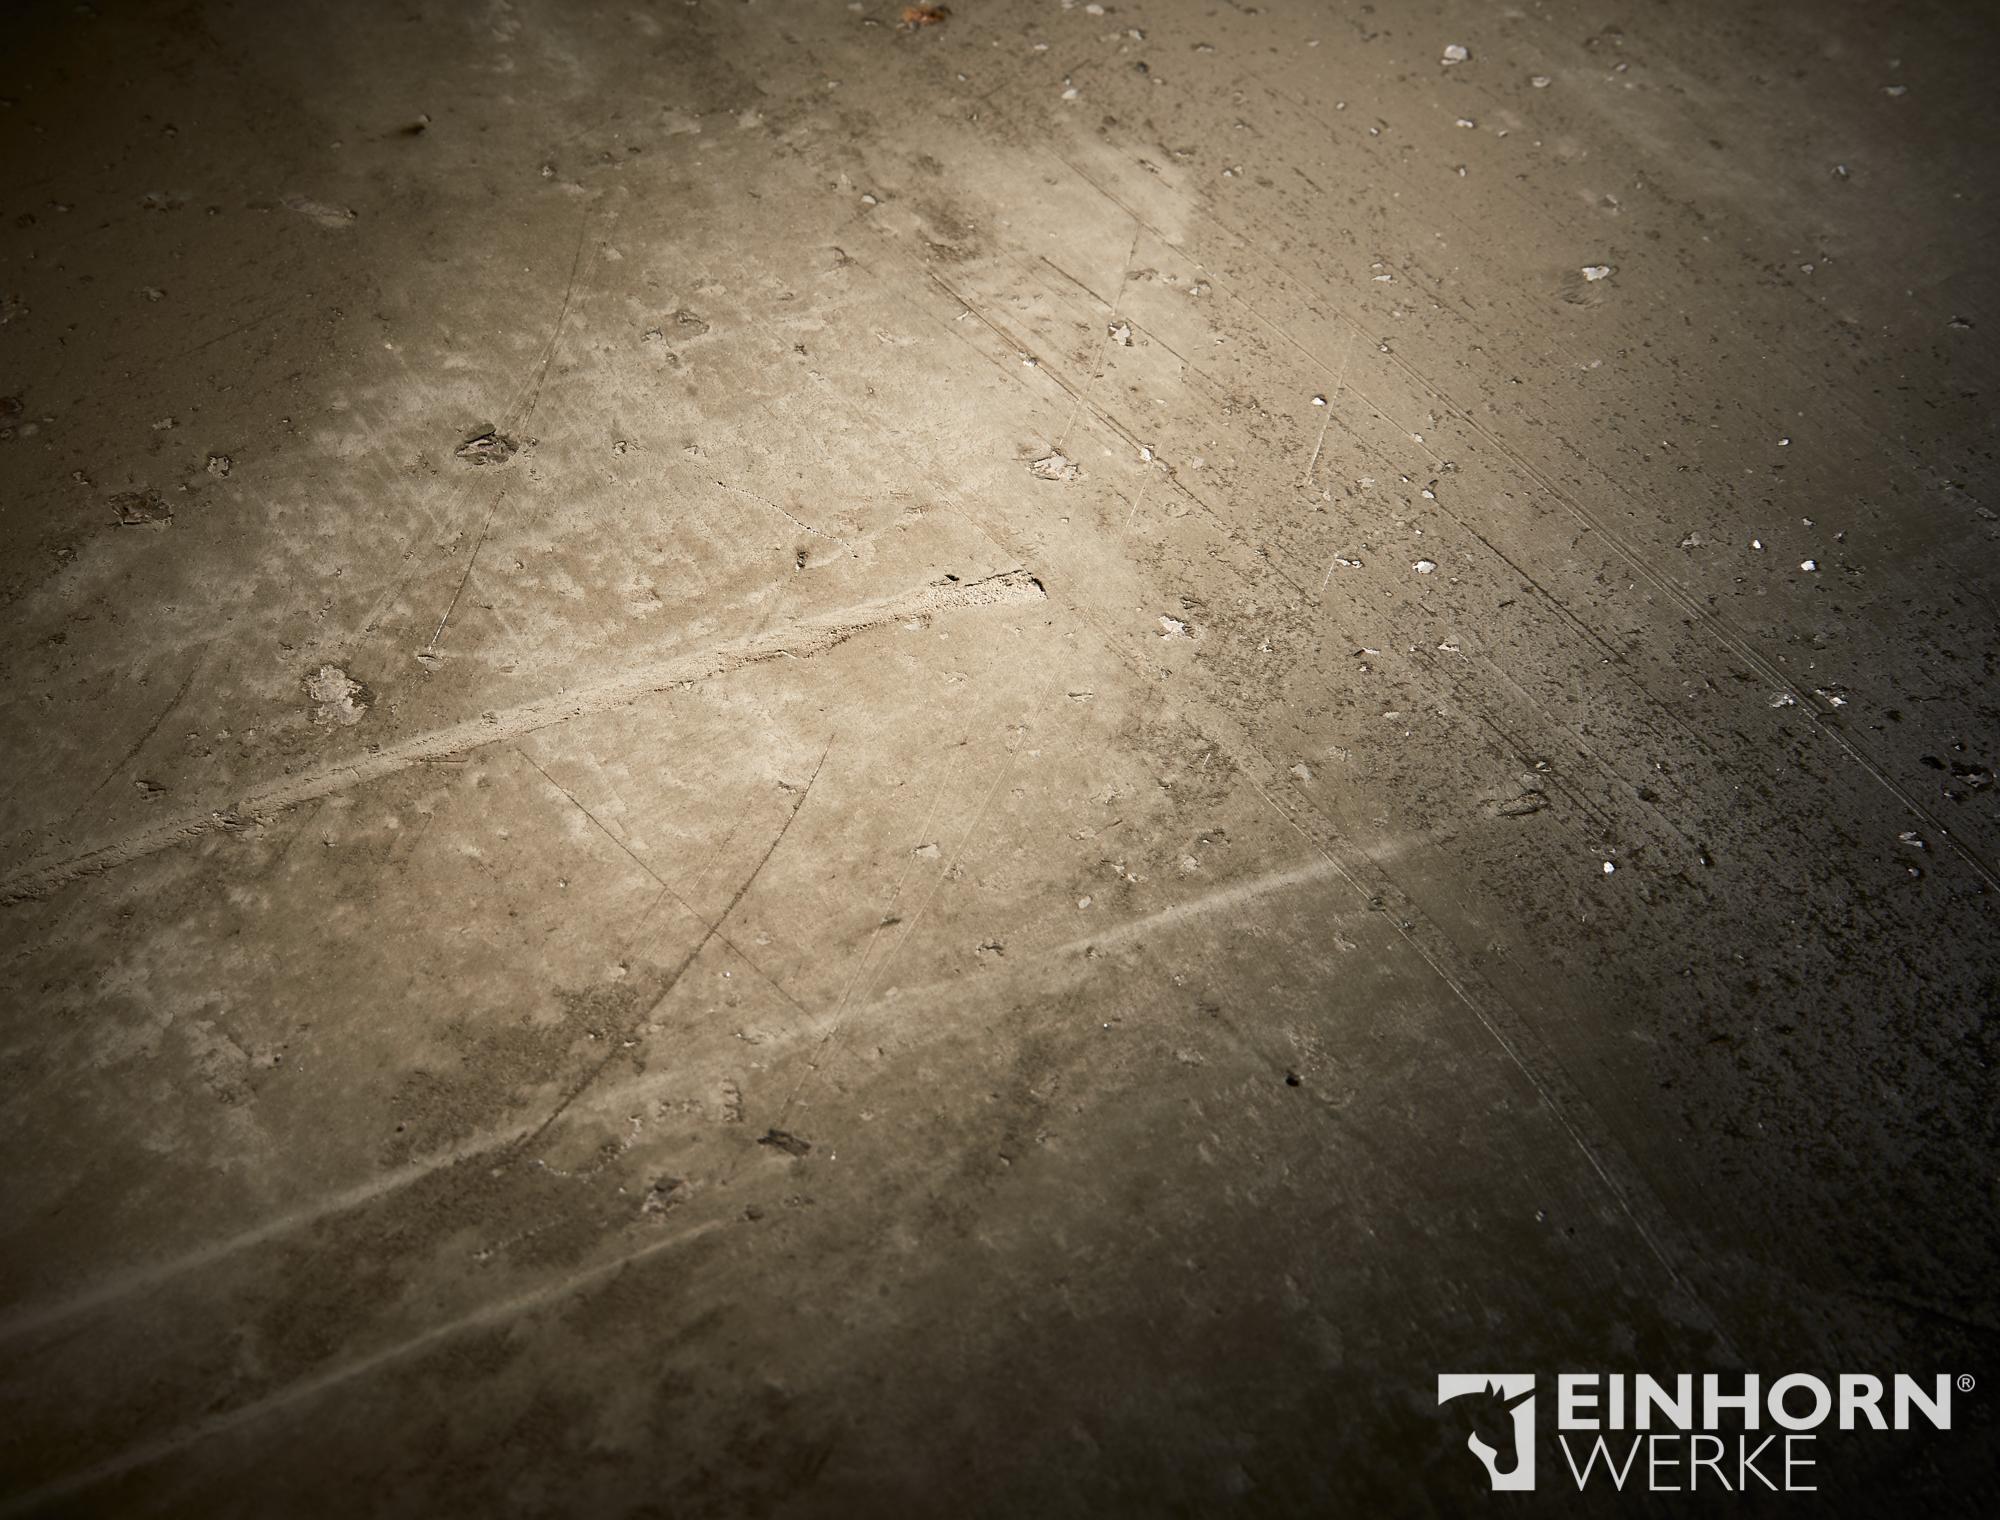 STUCCORINO 0804 + + Perlglimmer grob + STUCCORINO Fresco 0802 + EINHORN WERKE ® Wand- & Bodenöl plus - Wandgestaltung